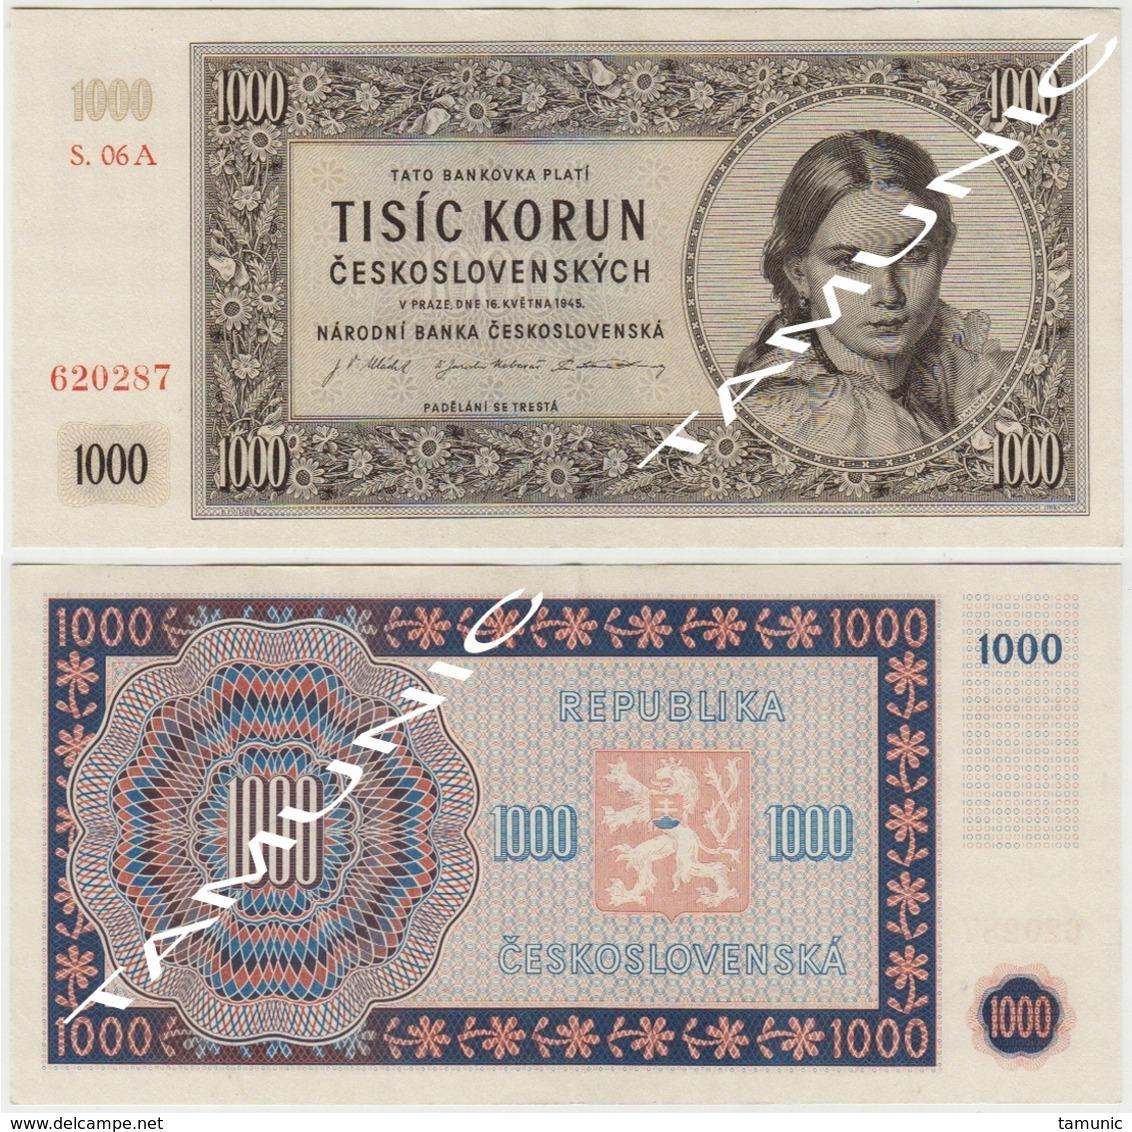 CZECHOSLOVAKIA CESKOSLOVENSKA 1000 Korun 1945 - Tchécoslovaquie